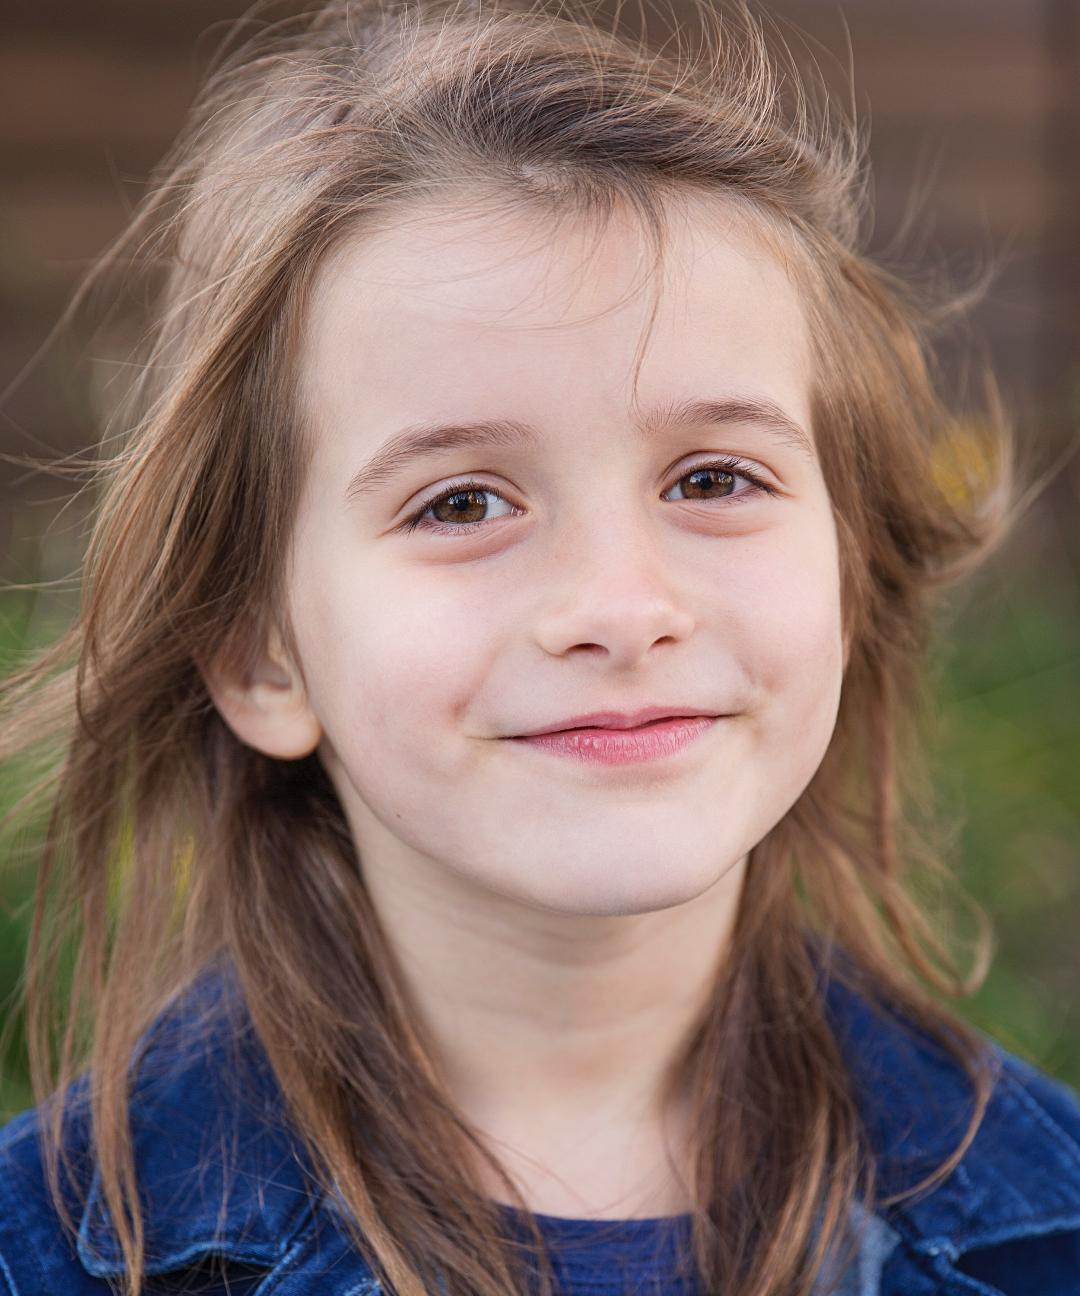 Chloe Loverro